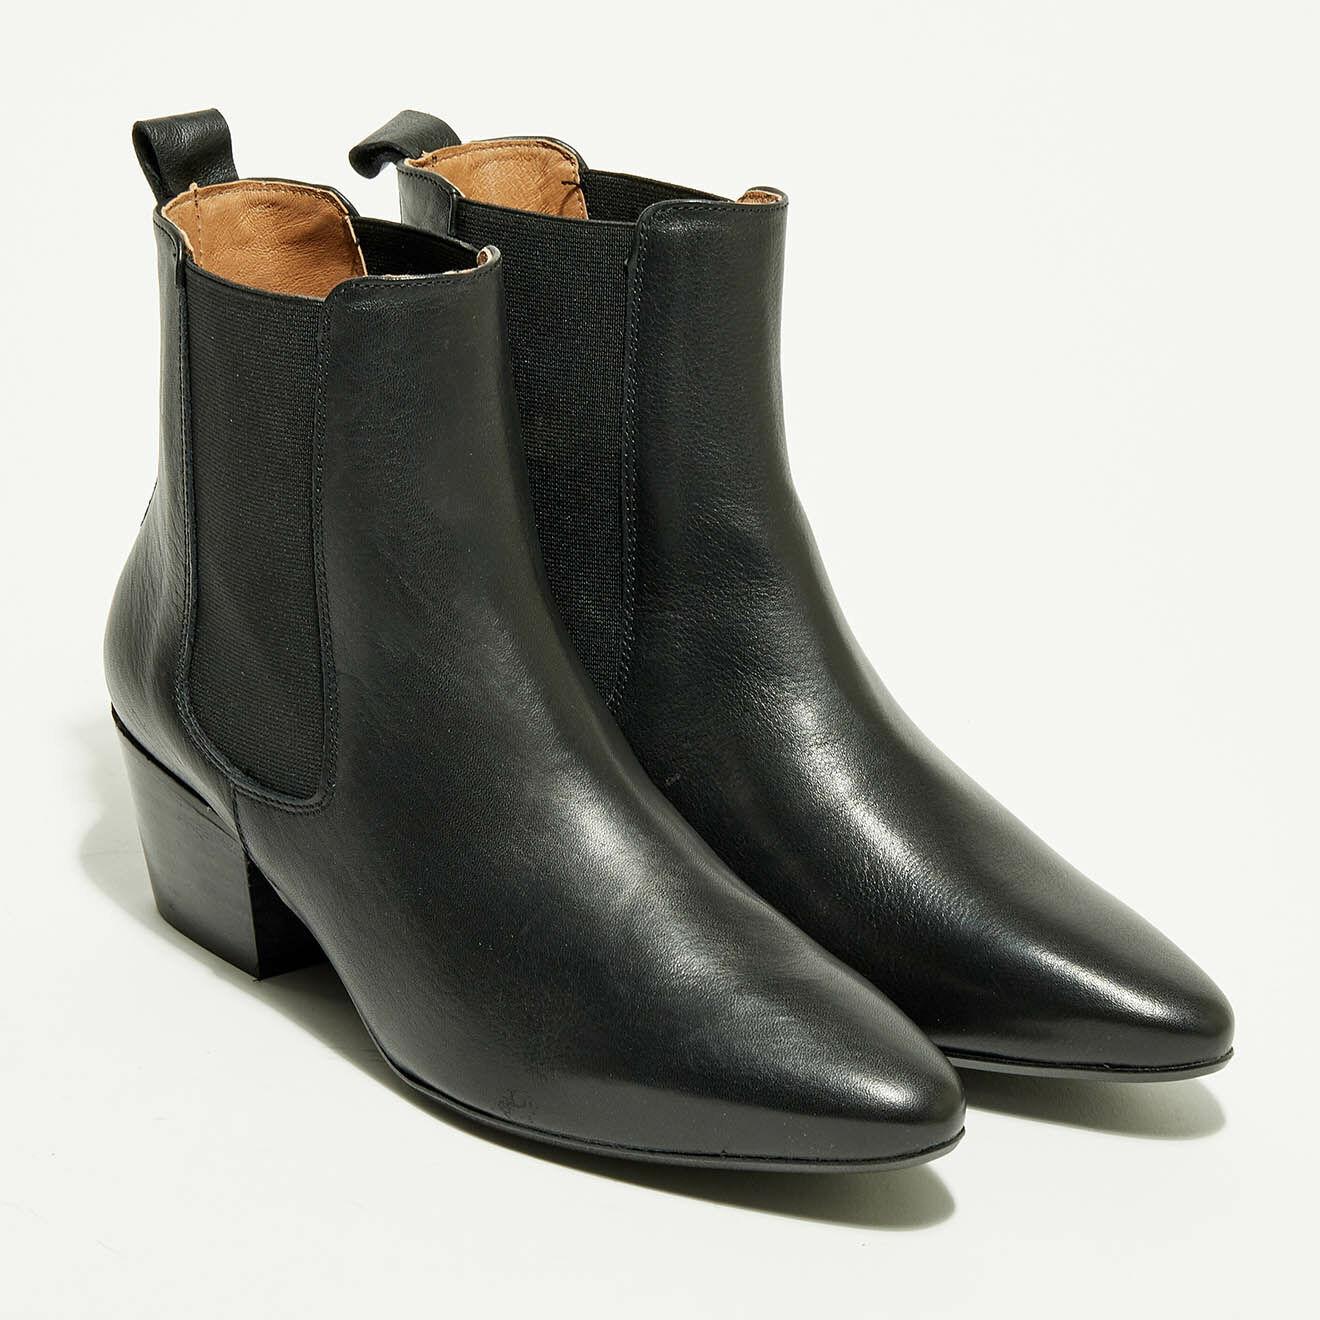 Chelsea Boots en Cuir Agathe noires - Apologie - Modalova